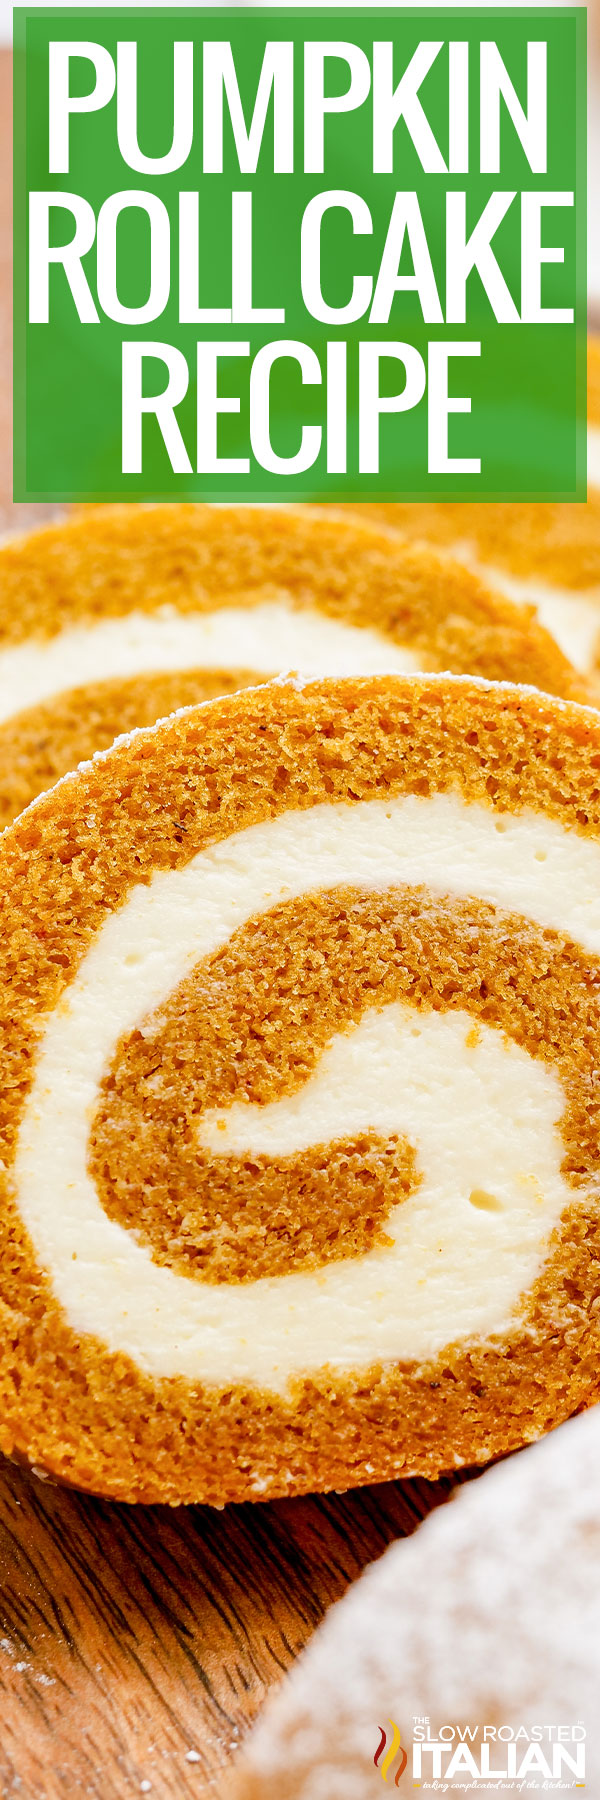 pumpkin roll cake closeup